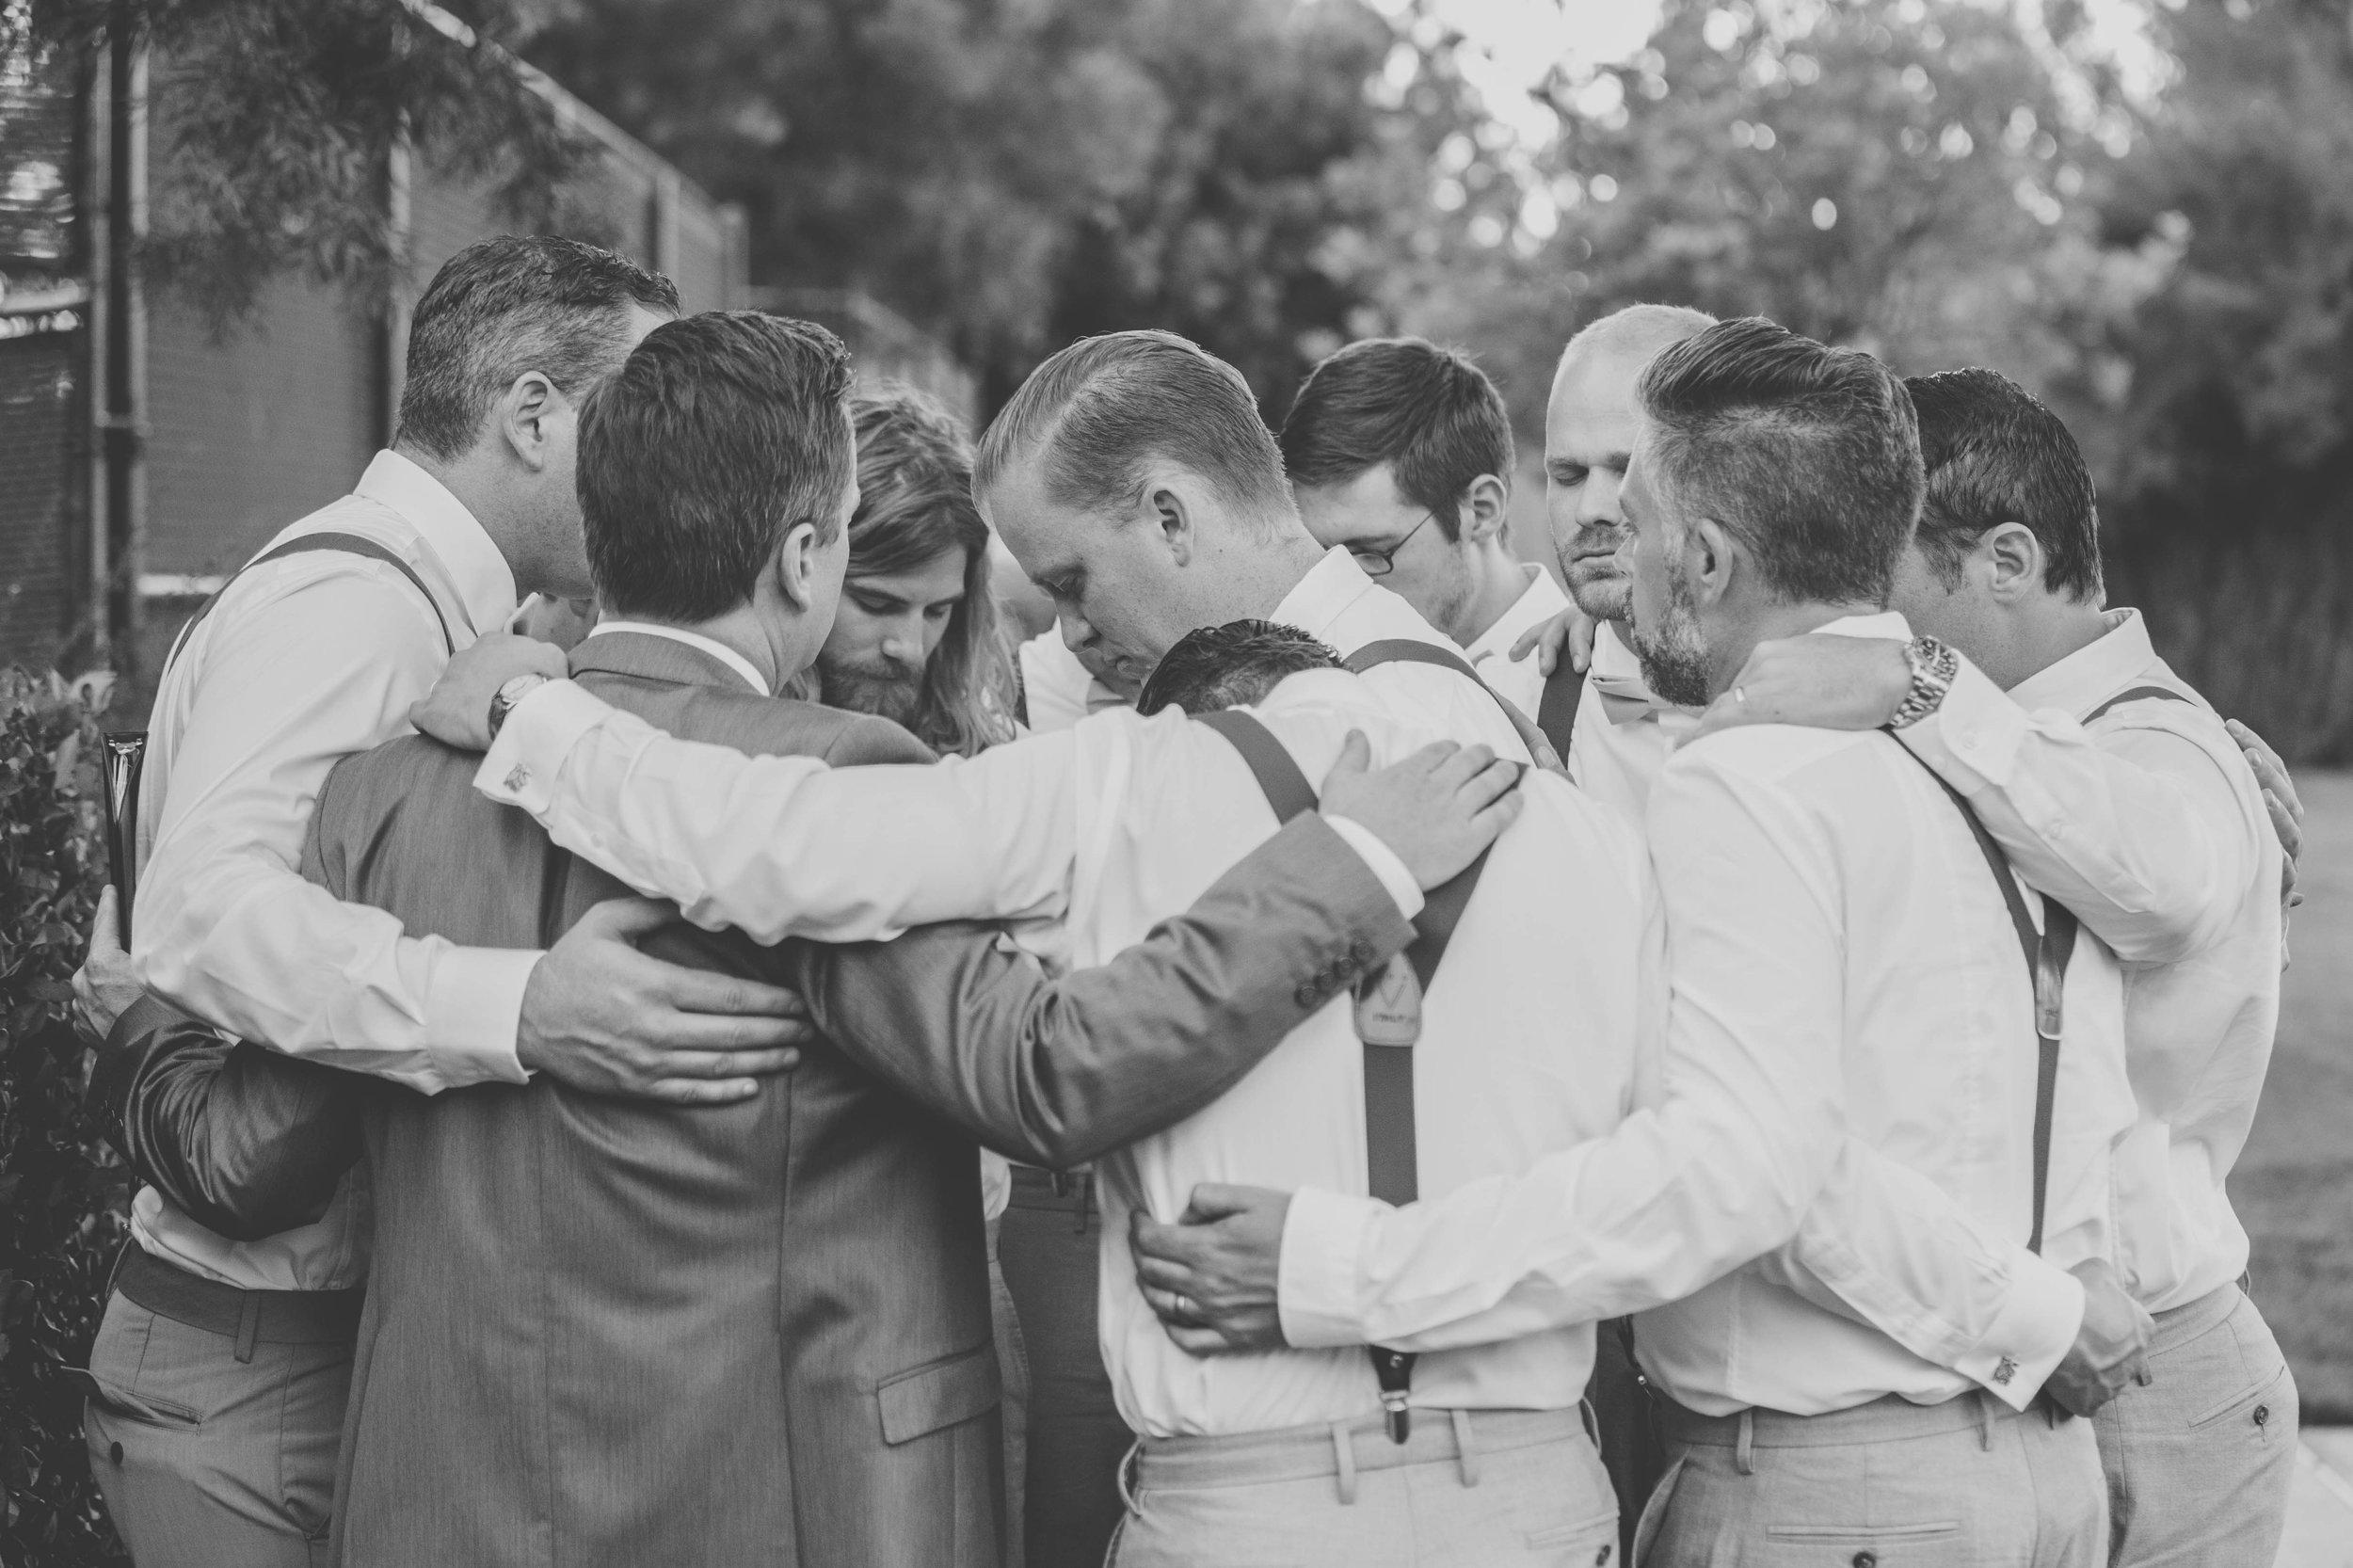 20141024-DePartee-Wedding-APavone-046-sm.jpg